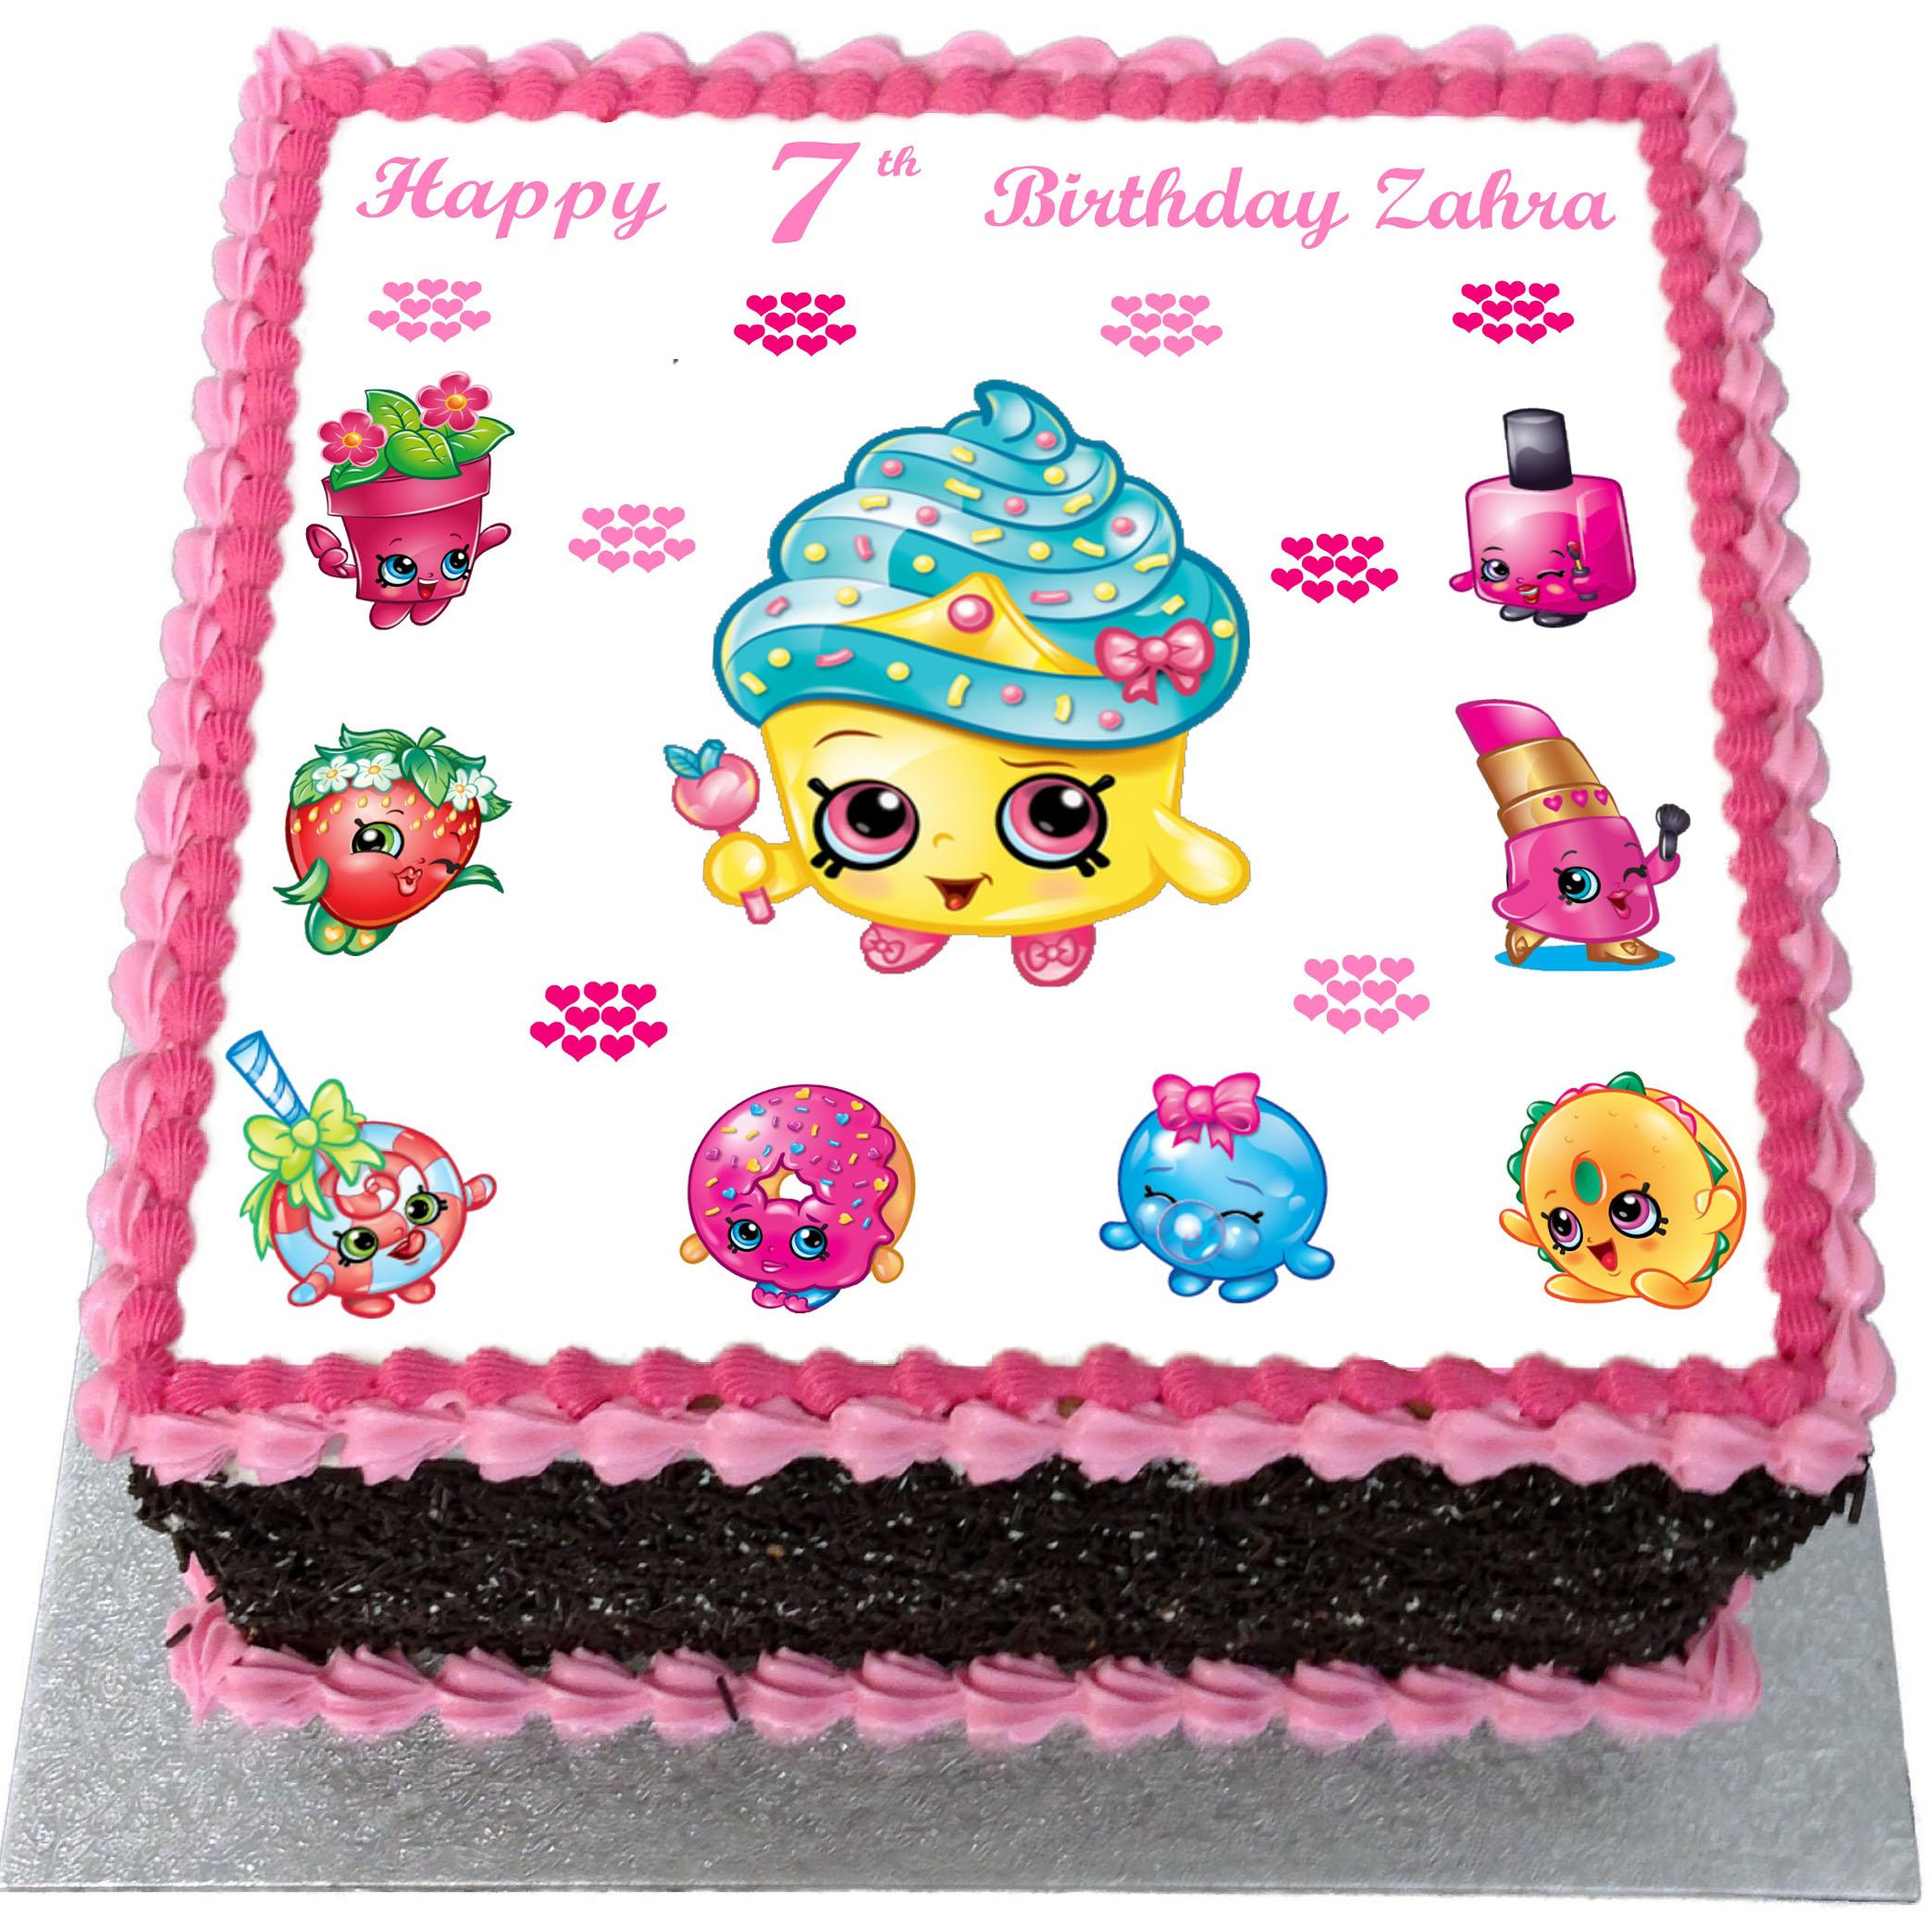 Phenomenal Shopkins Birthday Cake Flecks Cakes Funny Birthday Cards Online Alyptdamsfinfo